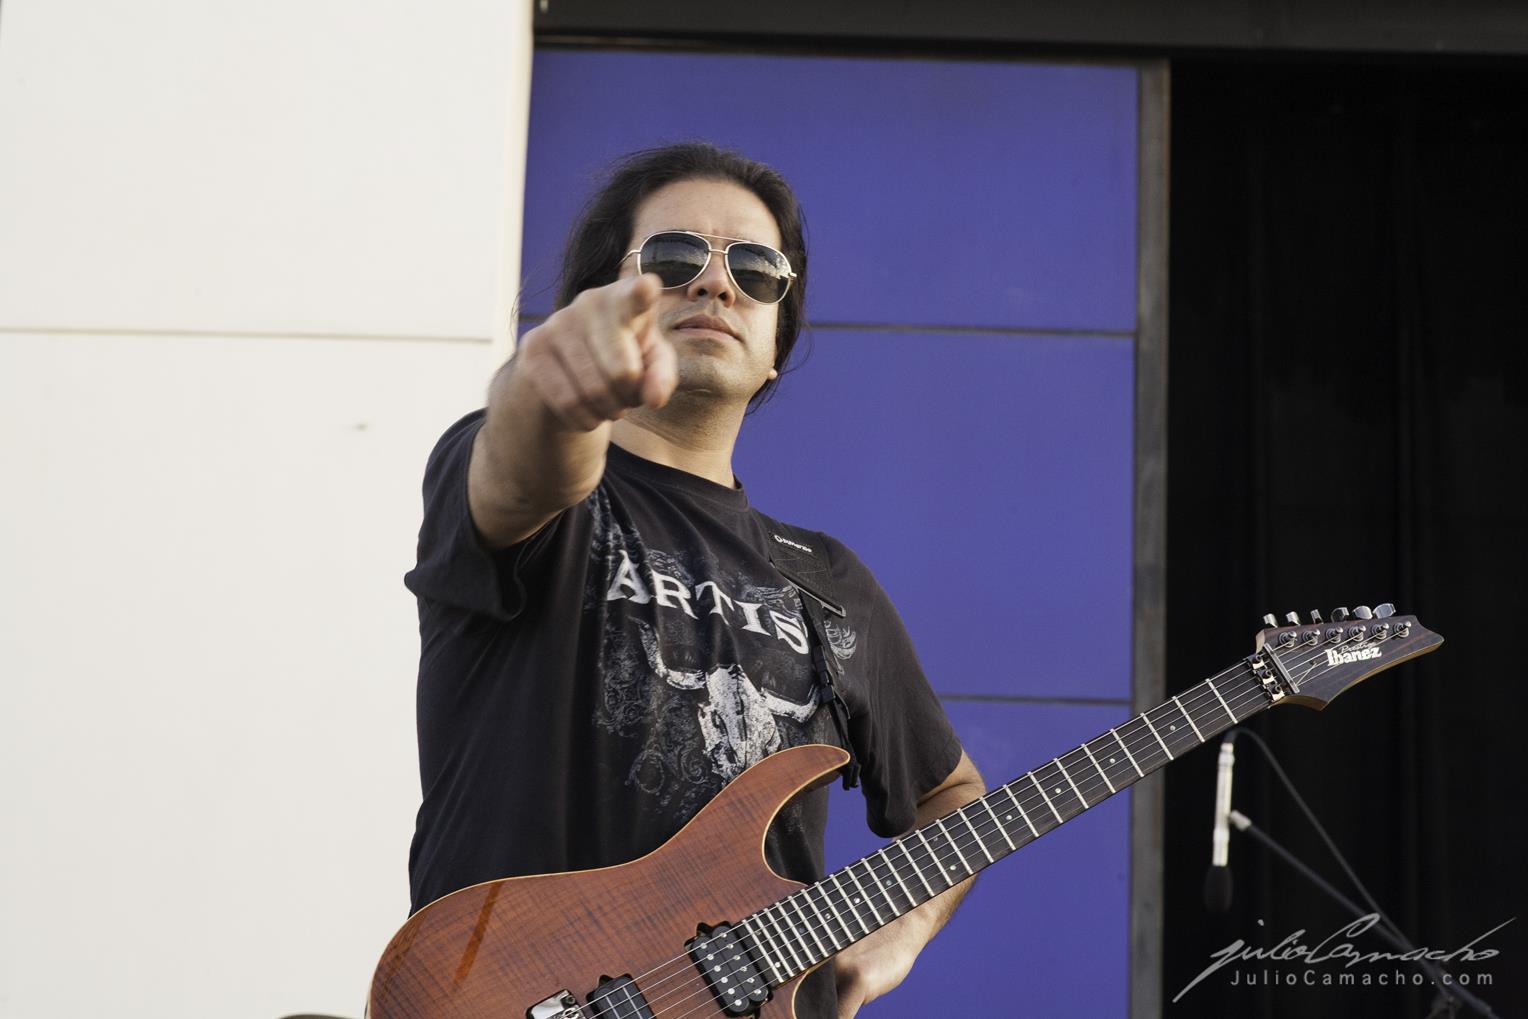 2014-10-30 31 CAST TOUR Ensenada y Tijuana - 0340 - www.Juli (Copy).jpg